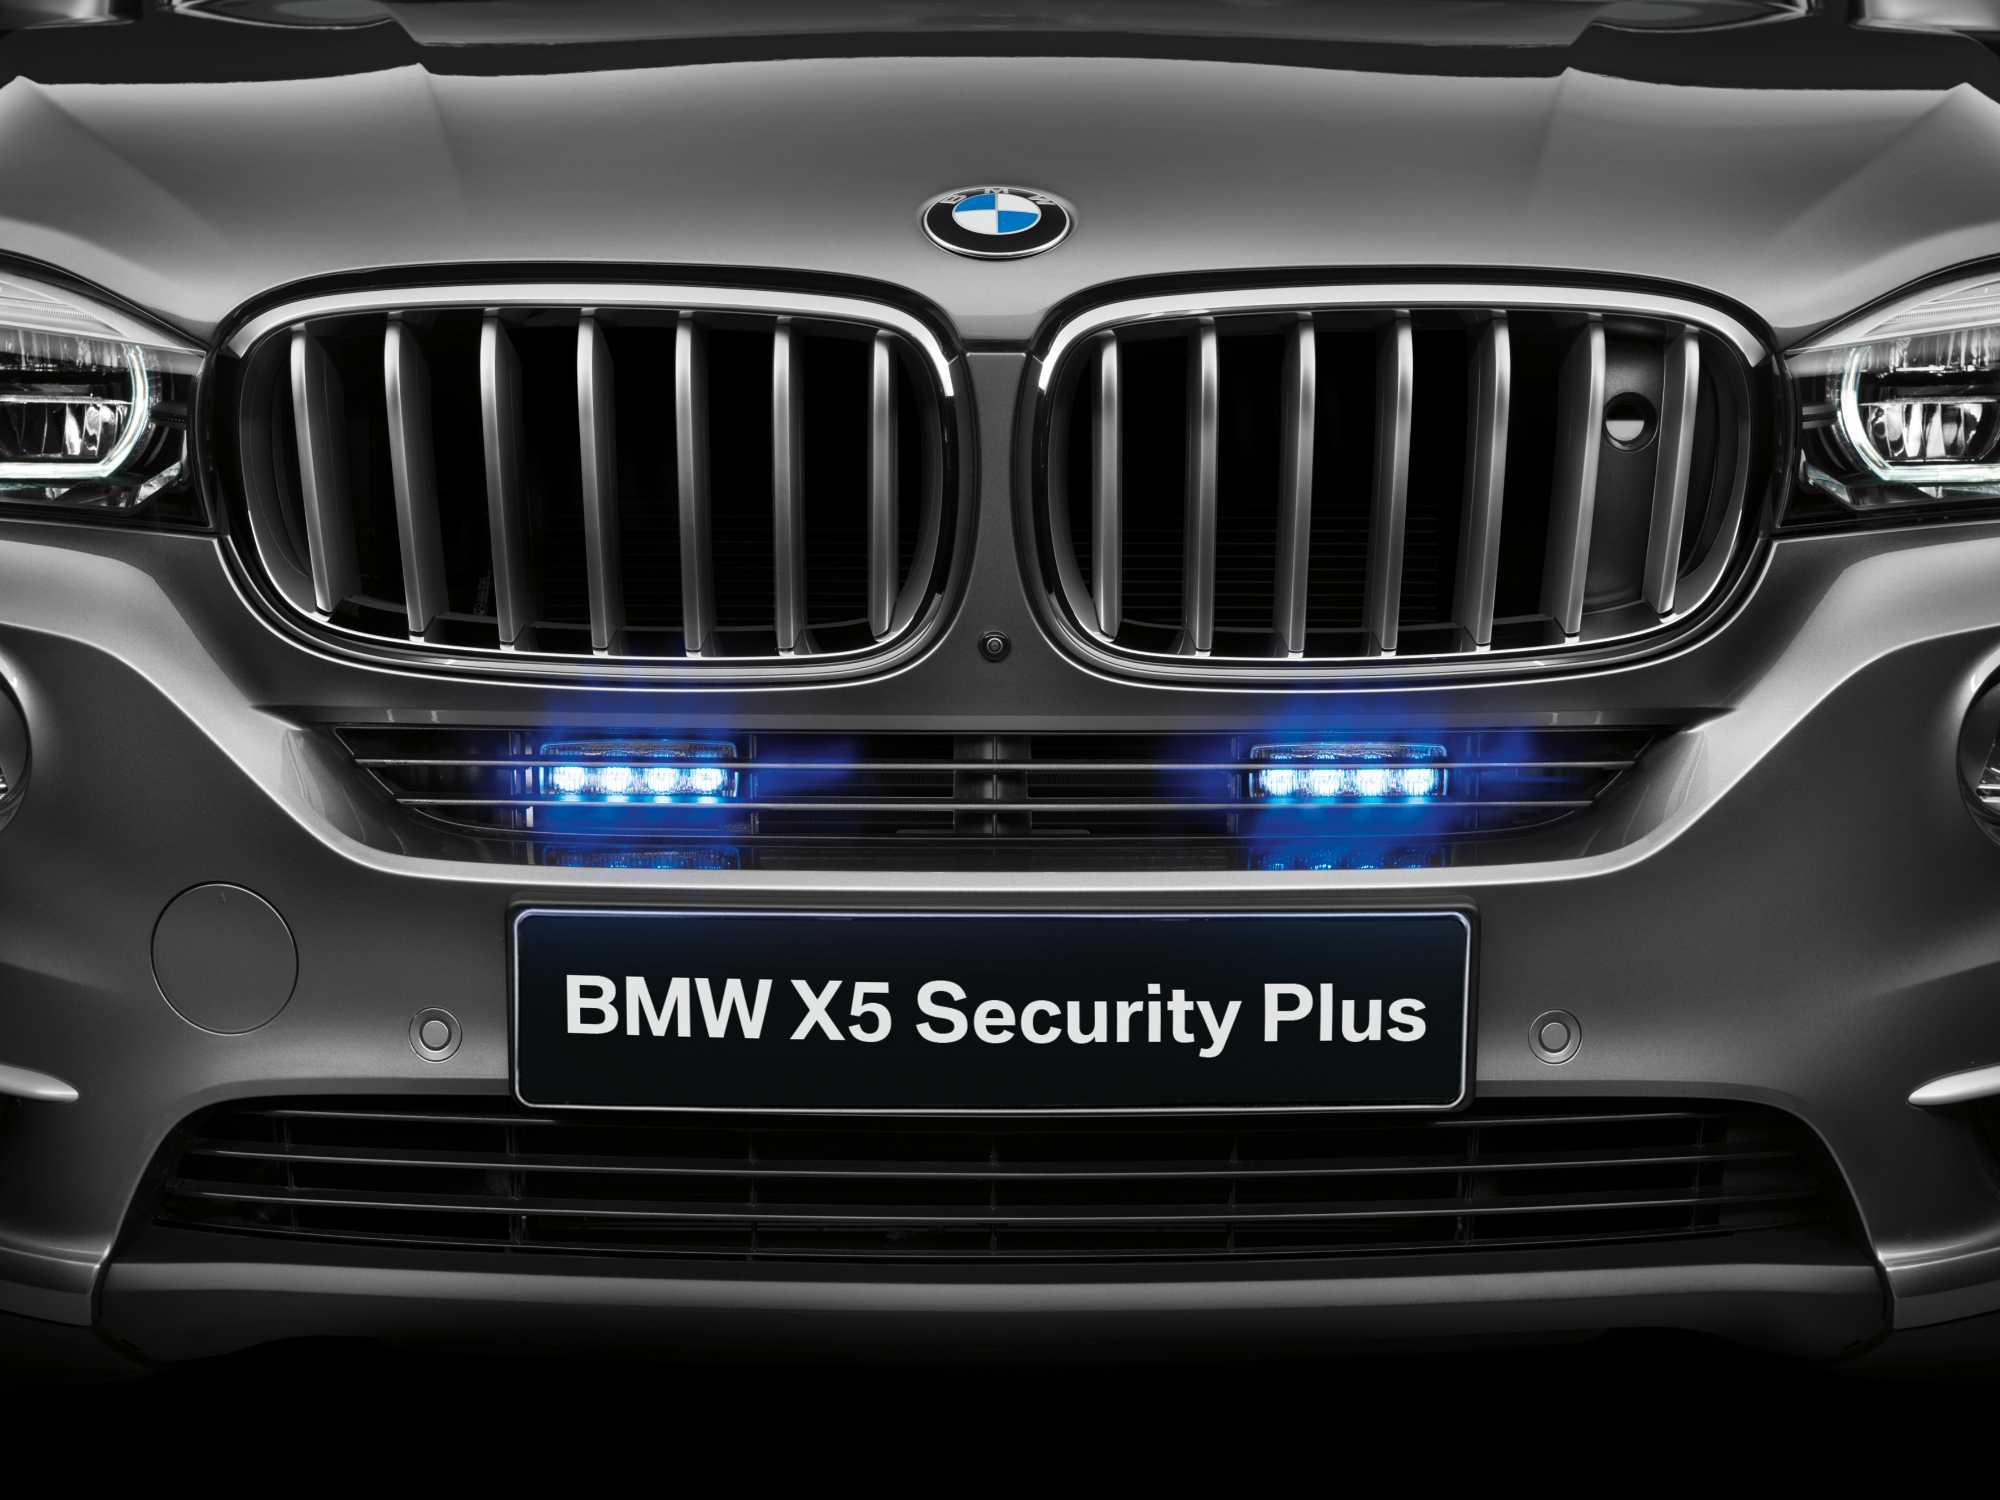 Bmw x5 security plus led flashing lights 072014 aloadofball Images